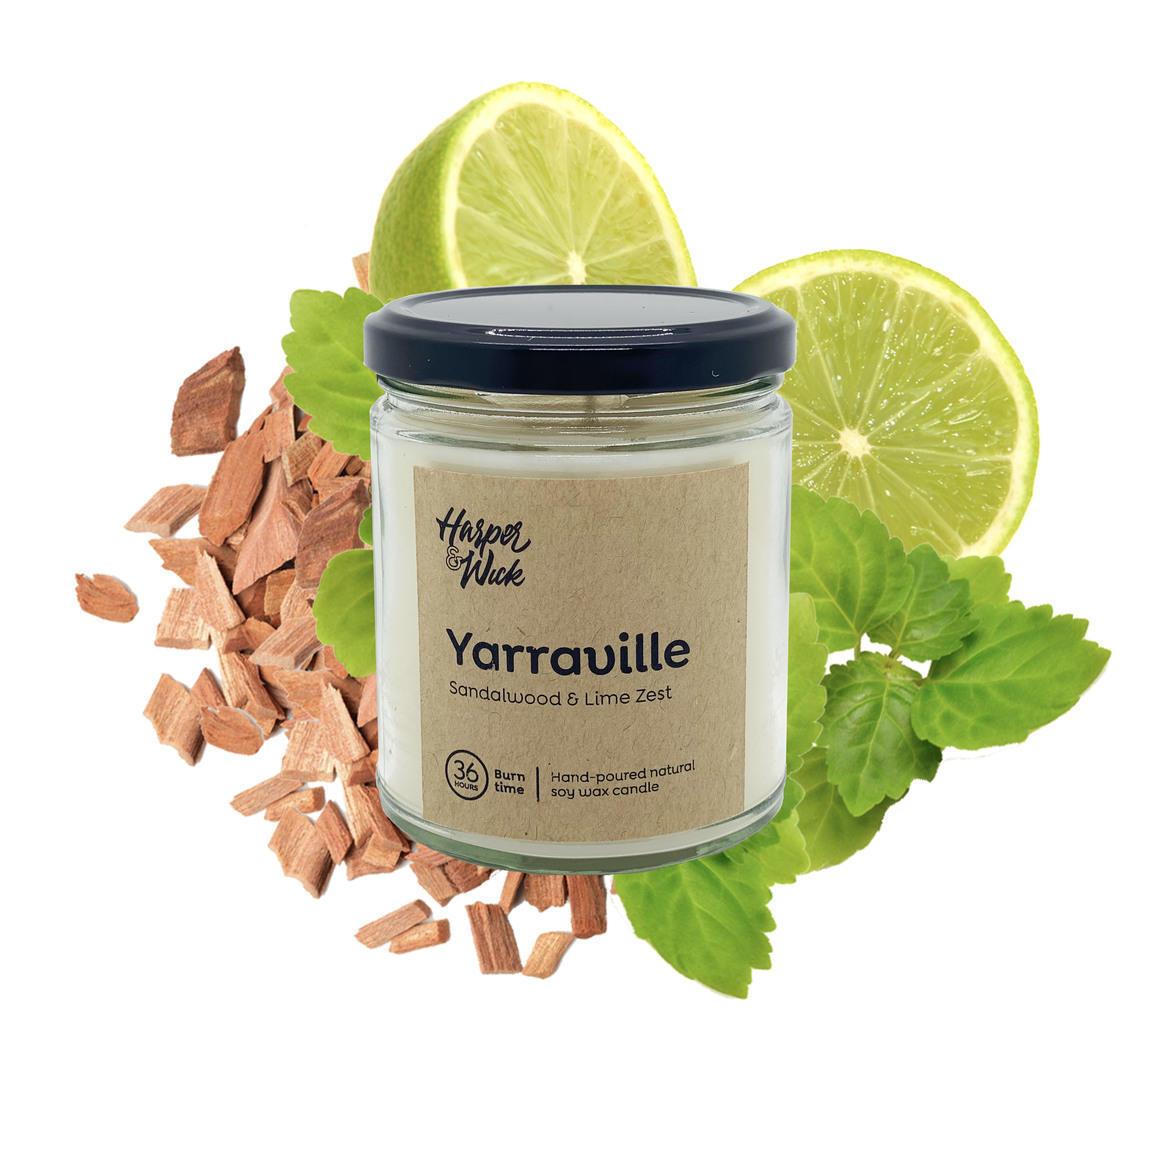 Yarraville - Sandalwood & Lime Zest | Trada Marketplace